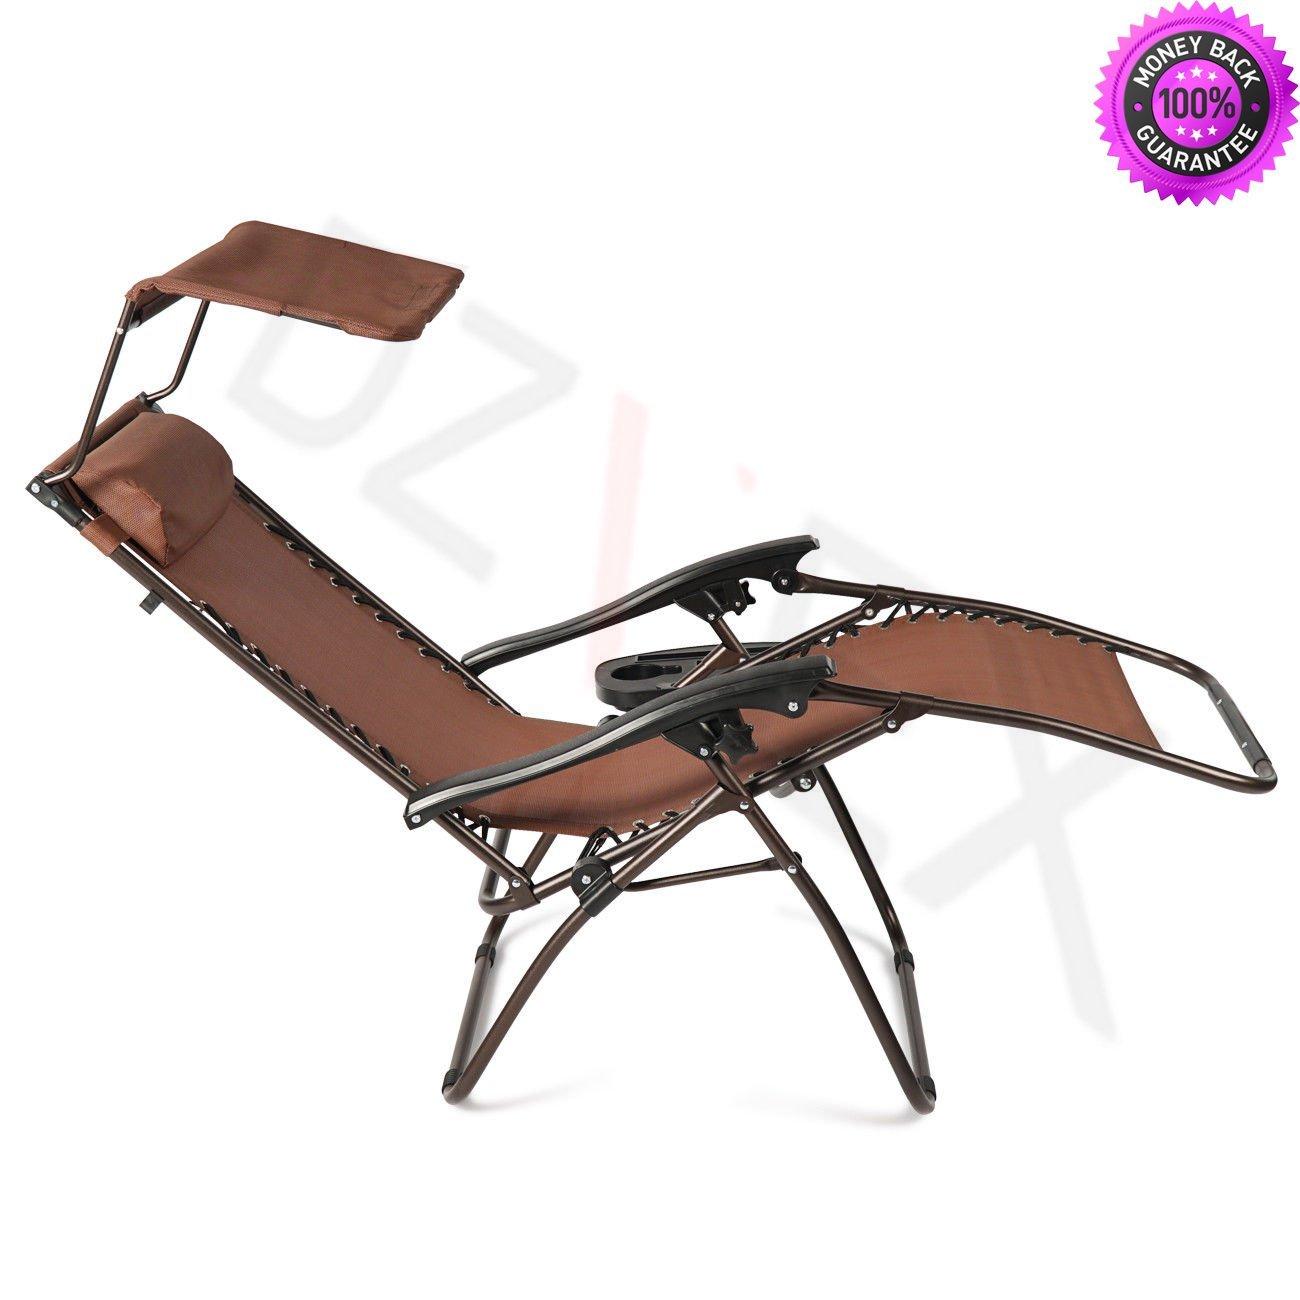 Cheap Park Swings Chair Find Park Swings Chair Deals On